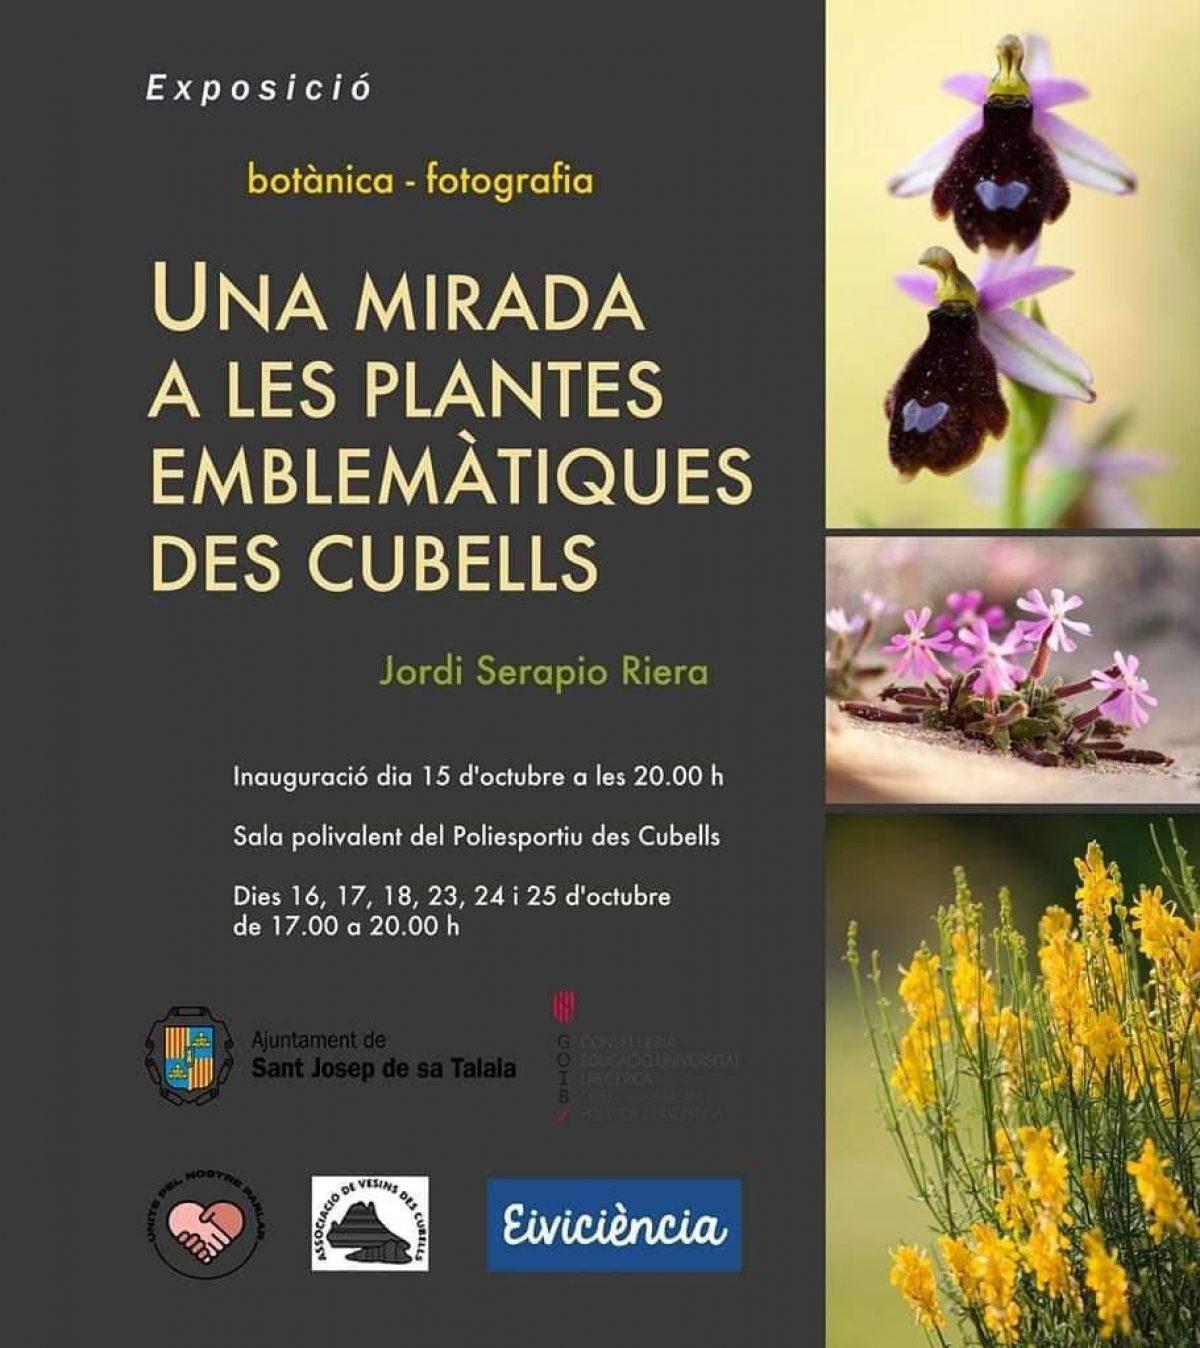 выставка-растения-es-cubells-ibiza-2020-welcometoibiza